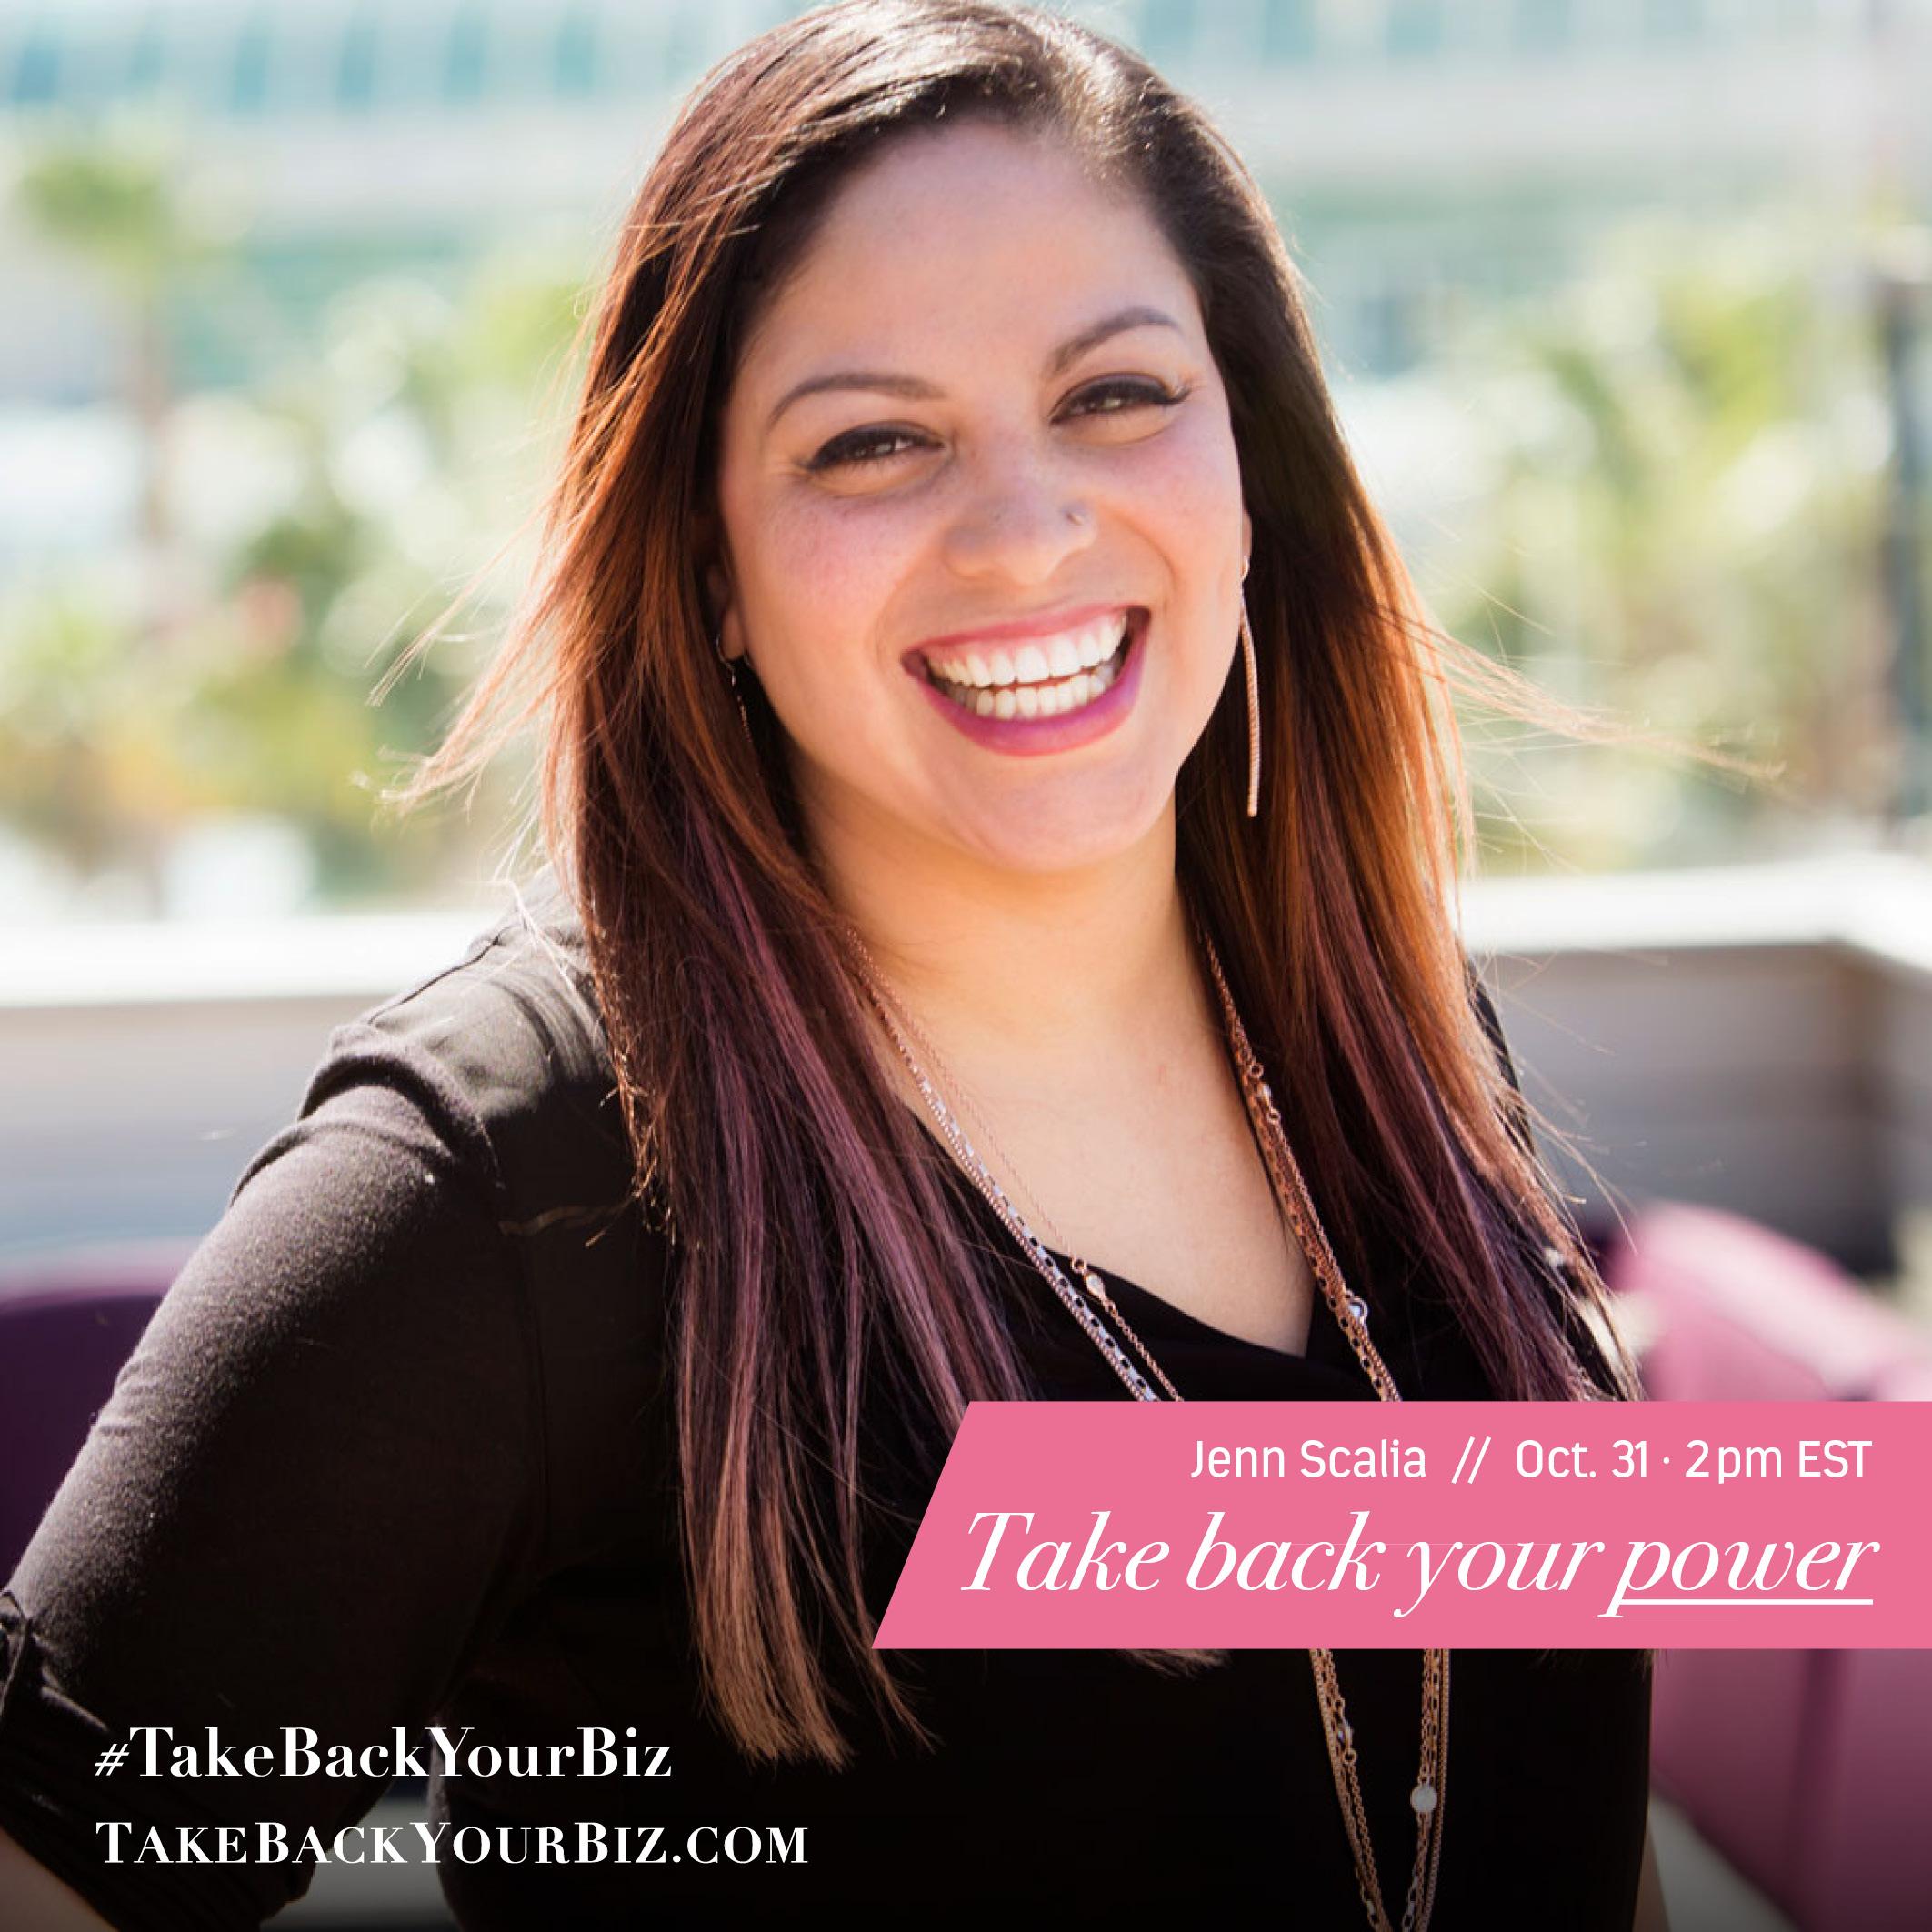 Take-Back-Your-Biz-Speakers-Jenn-Scalia